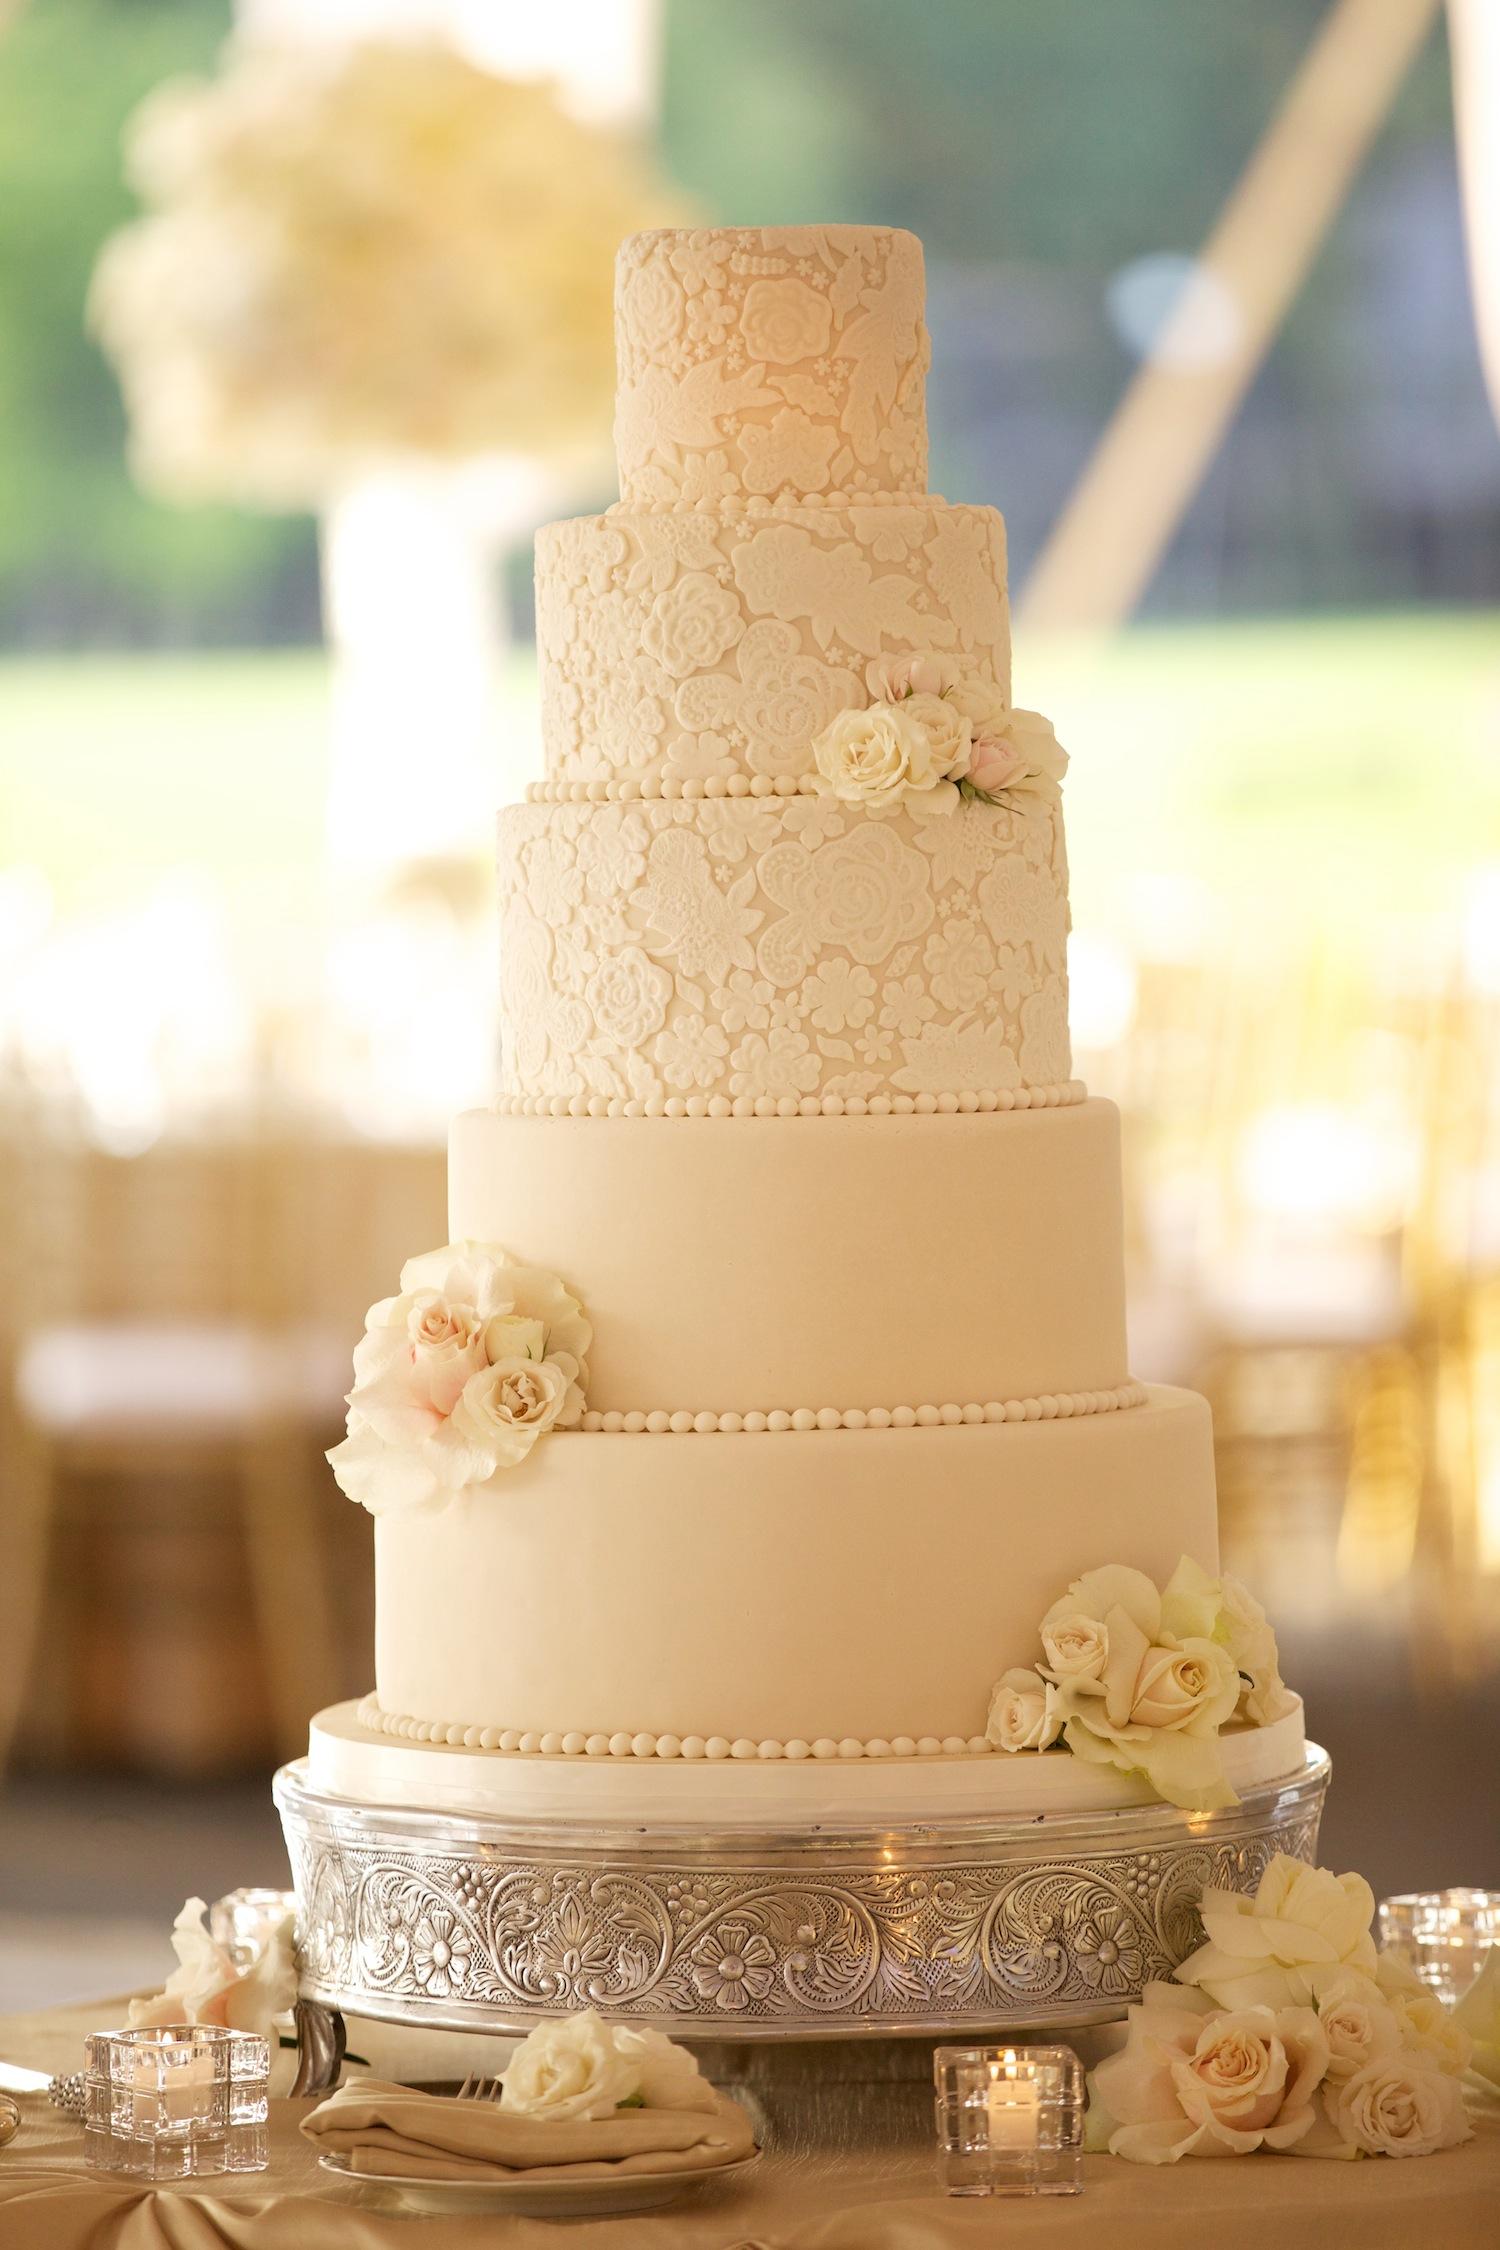 Lace pattern wedding cake at Miss Illinois wedding reception